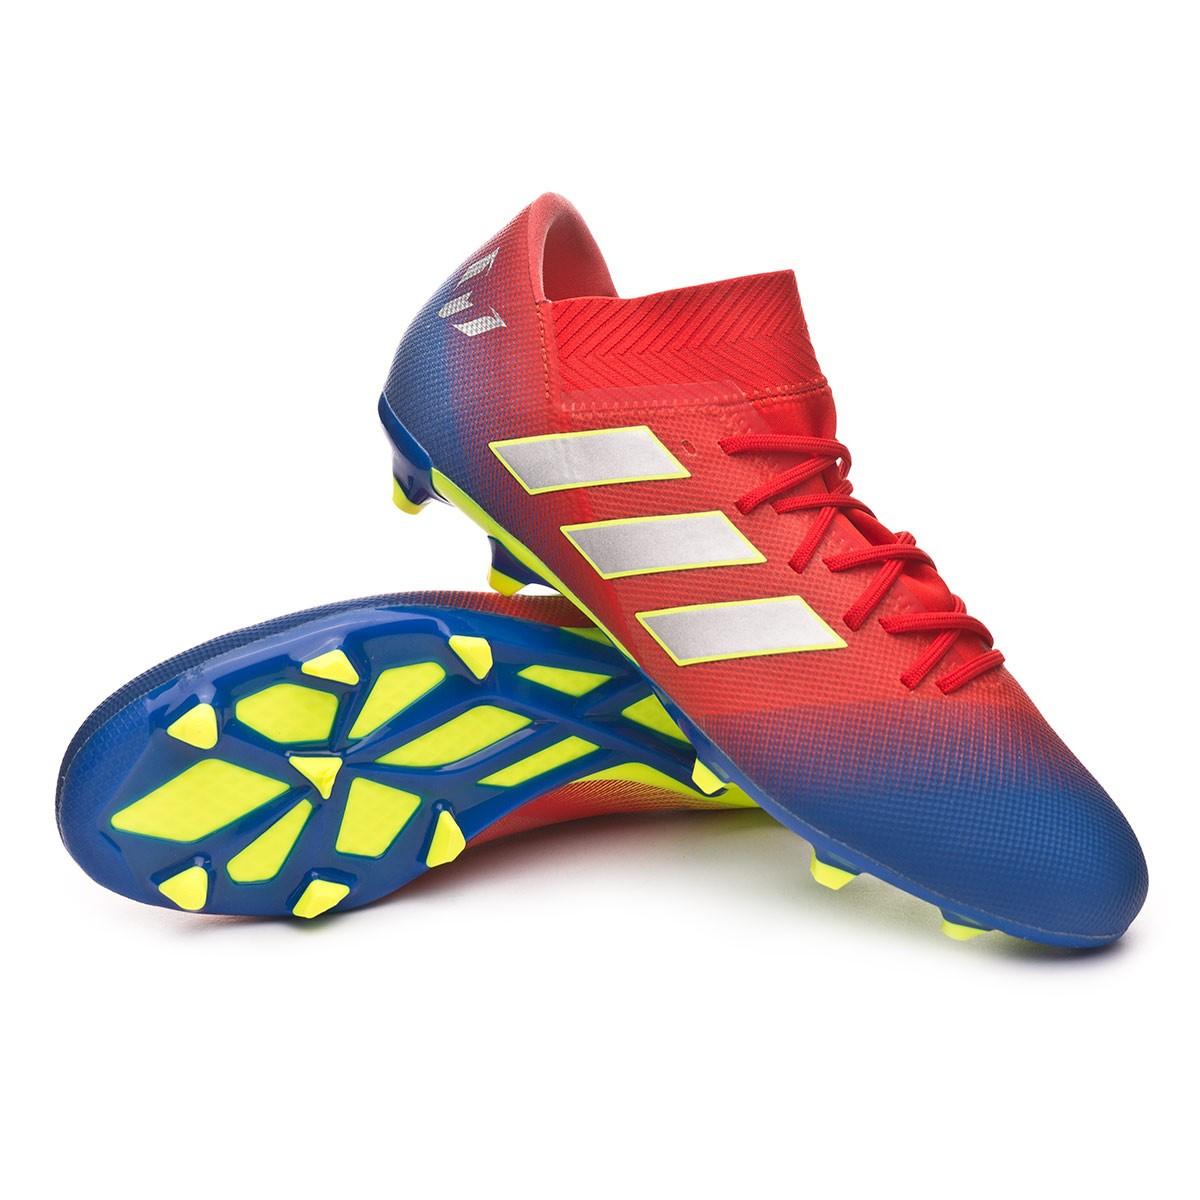 Football Boots adidas Nemeziz Messi 18